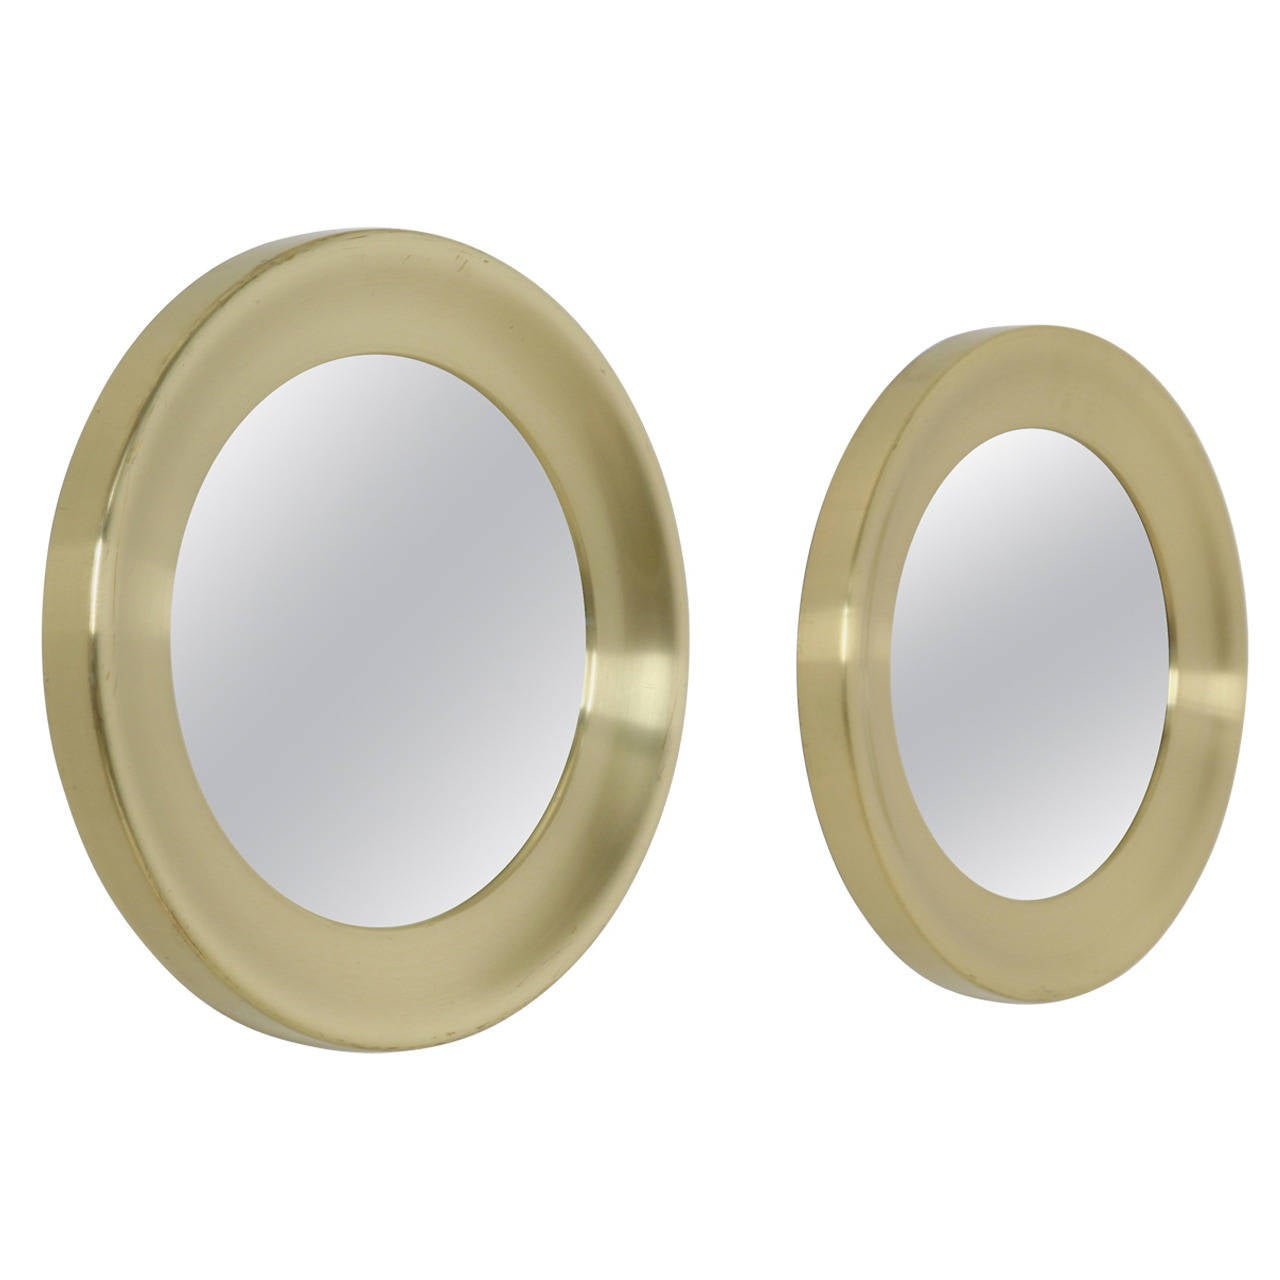 Pair of Round Brass Mirrors by Glasmaster, Markaryd, Sweden, 1960s